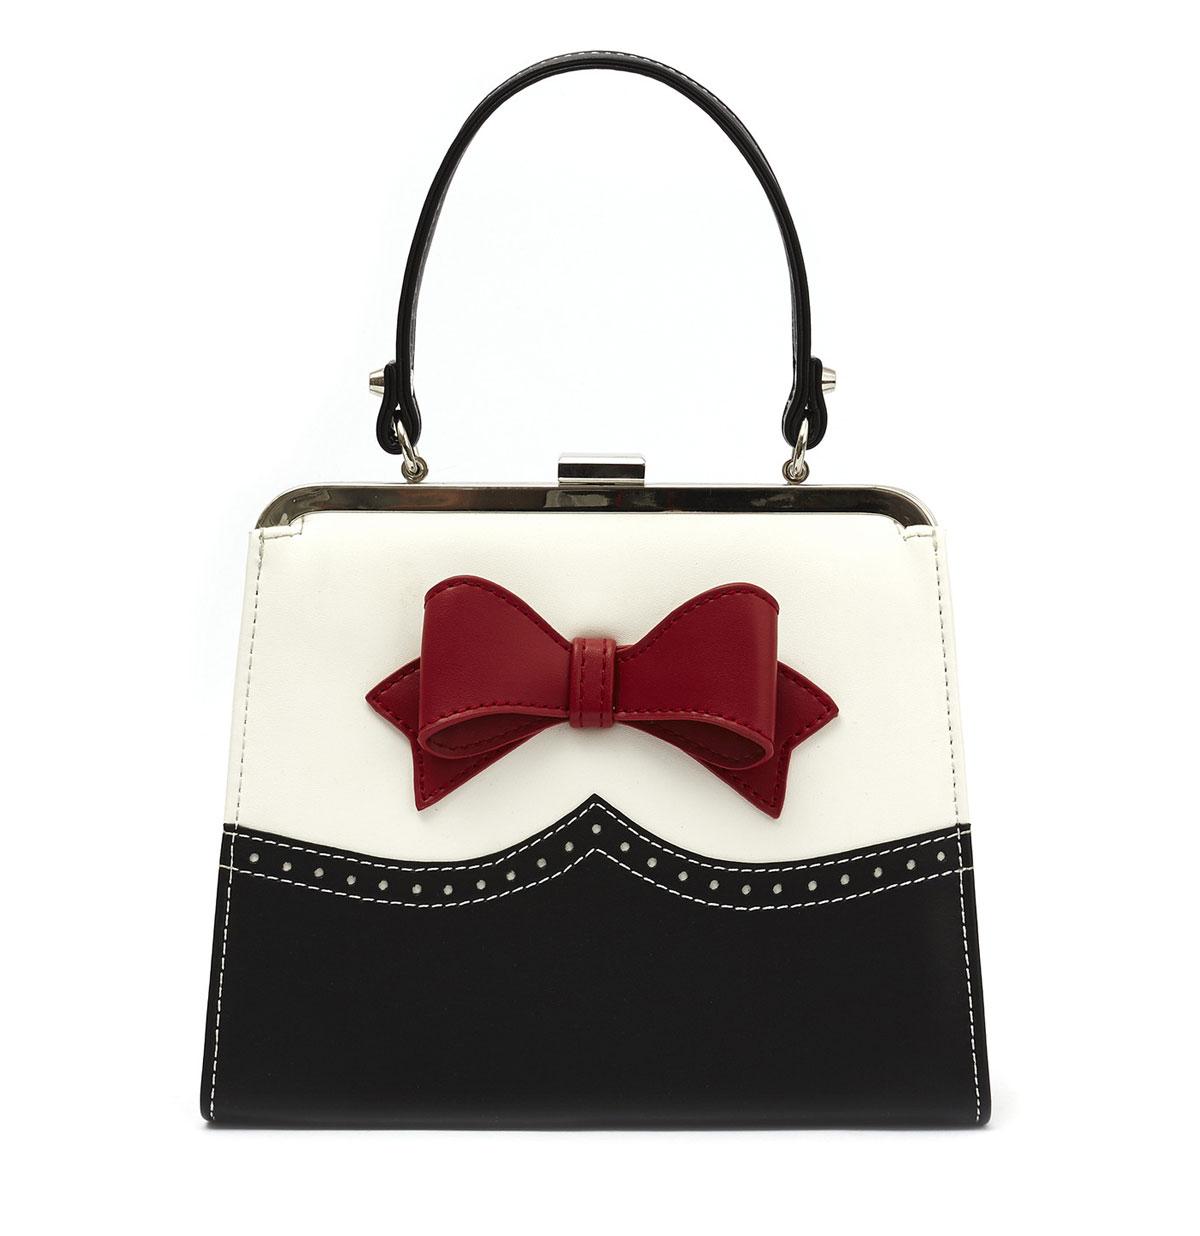 Inez Handbag Zwart/Creme/Rood